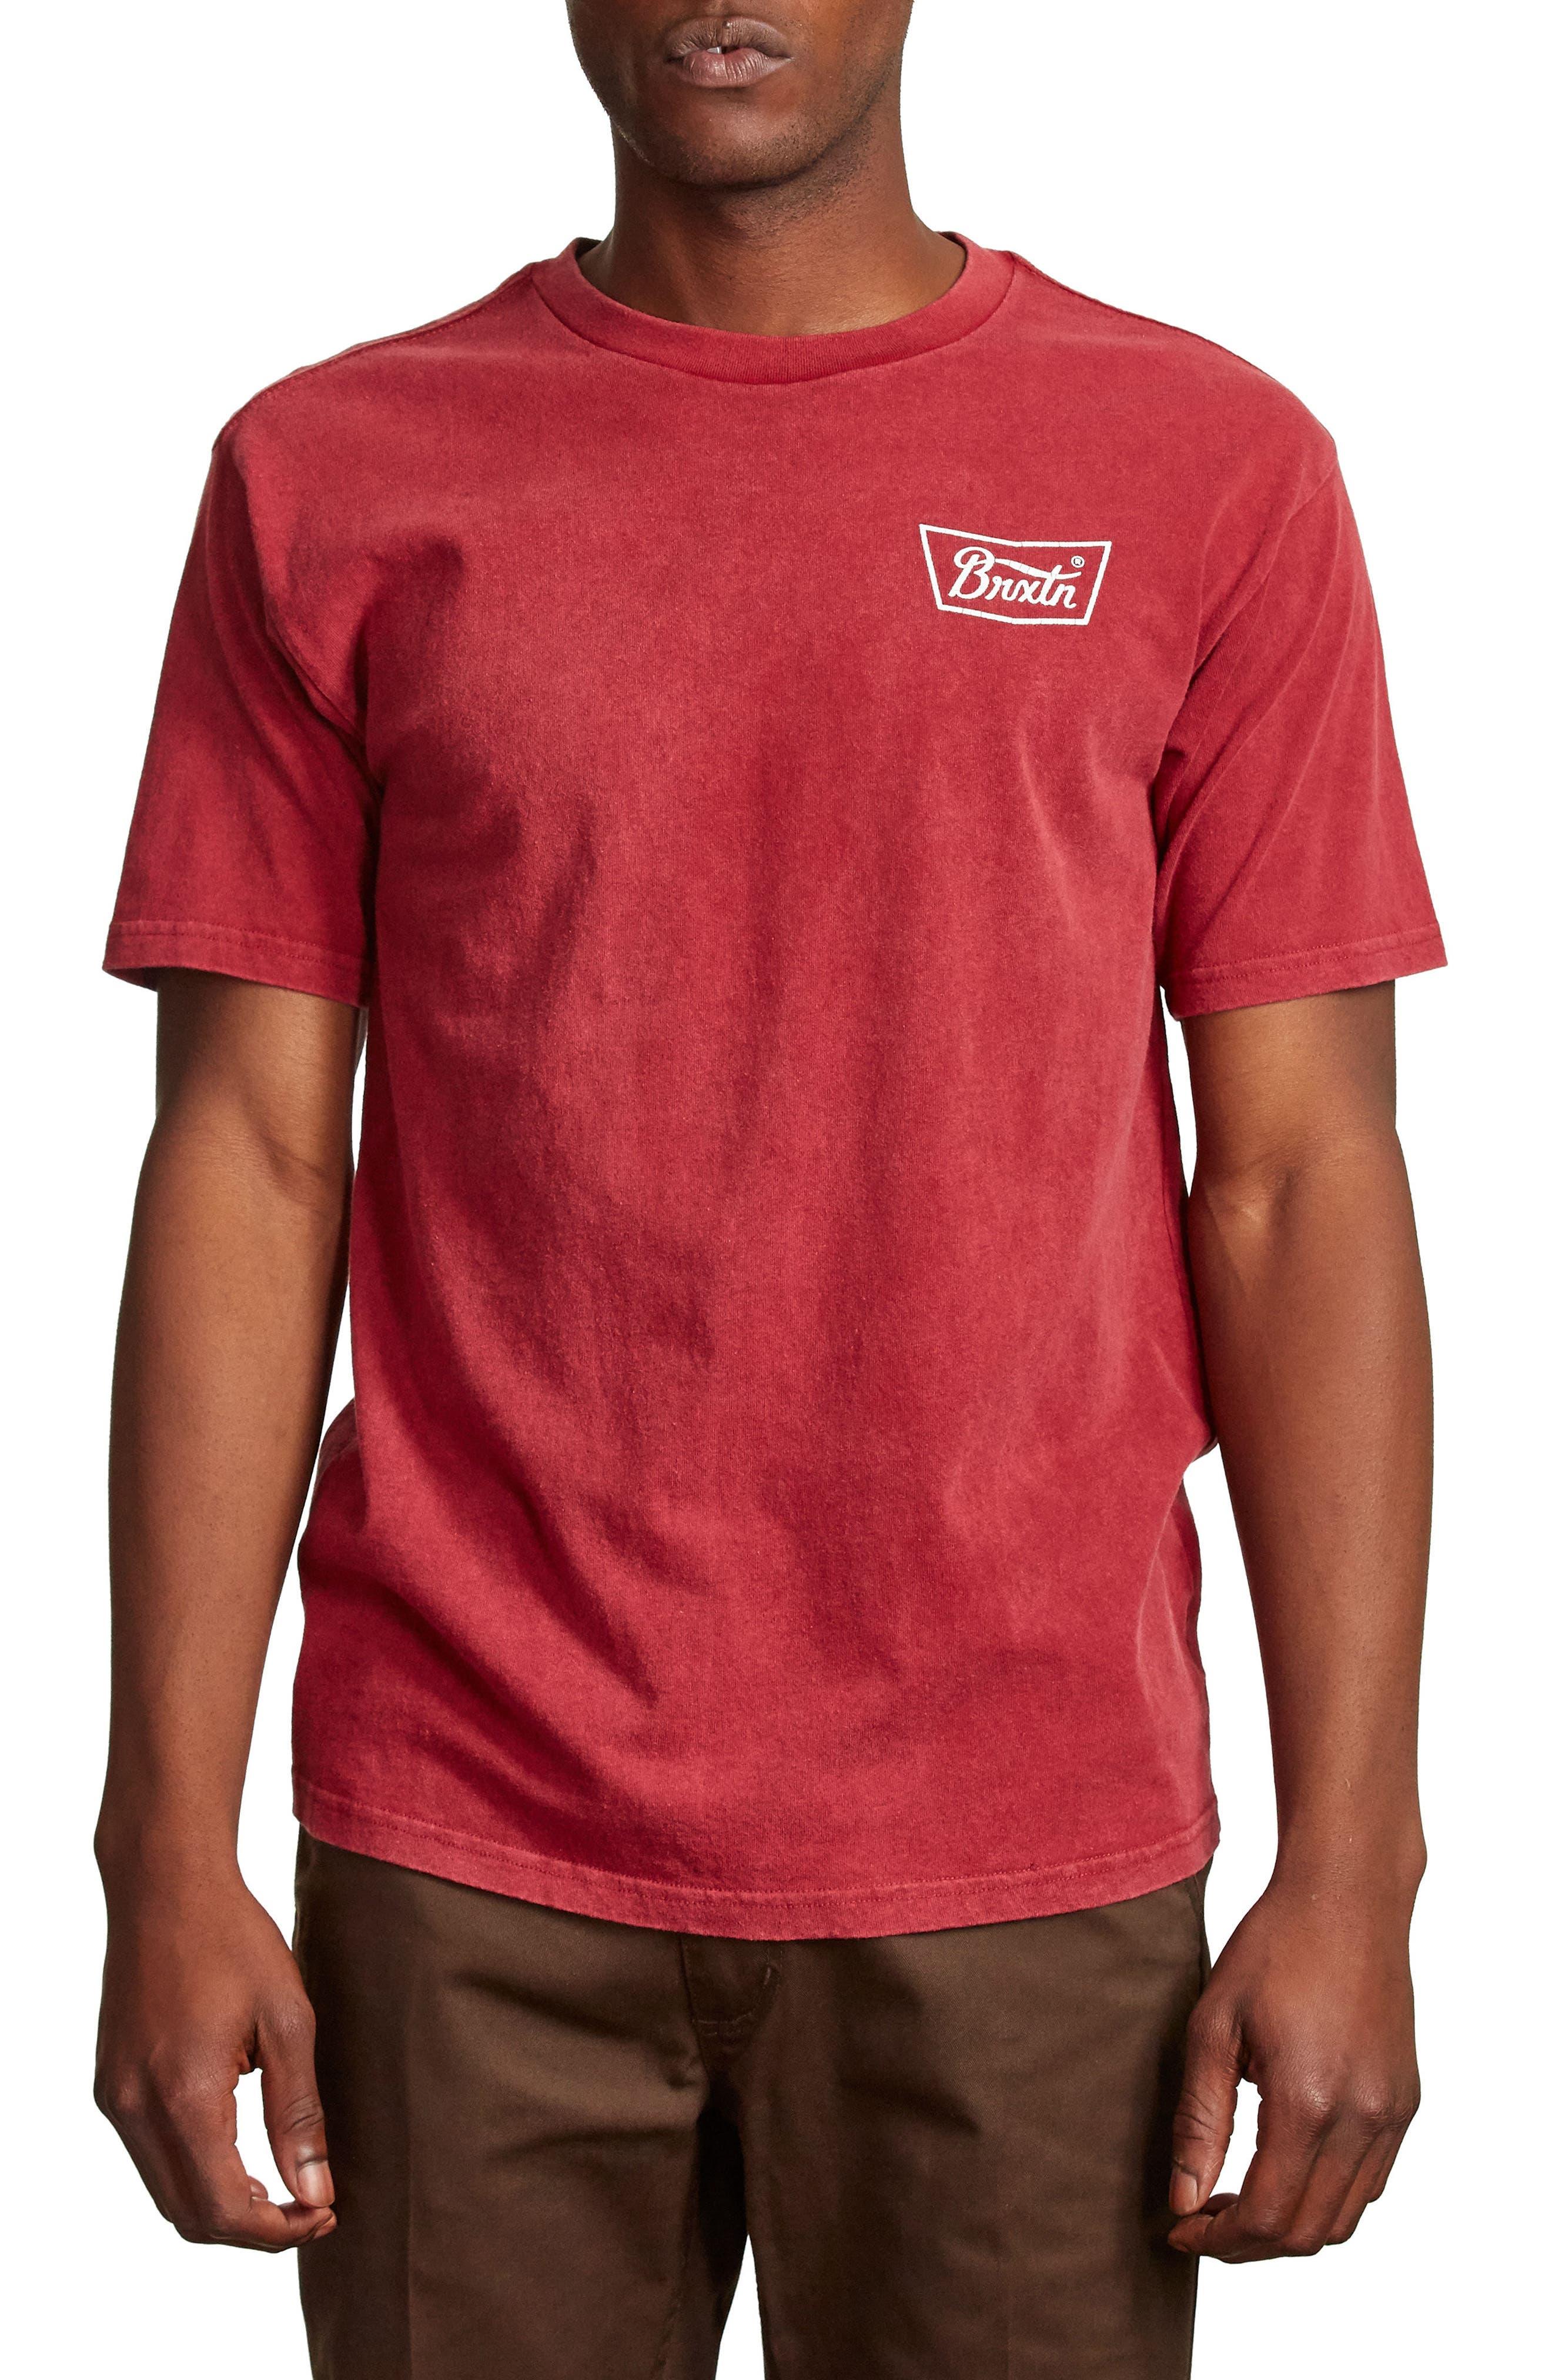 Stith Graphic T-Shirt,                             Main thumbnail 1, color,                             930